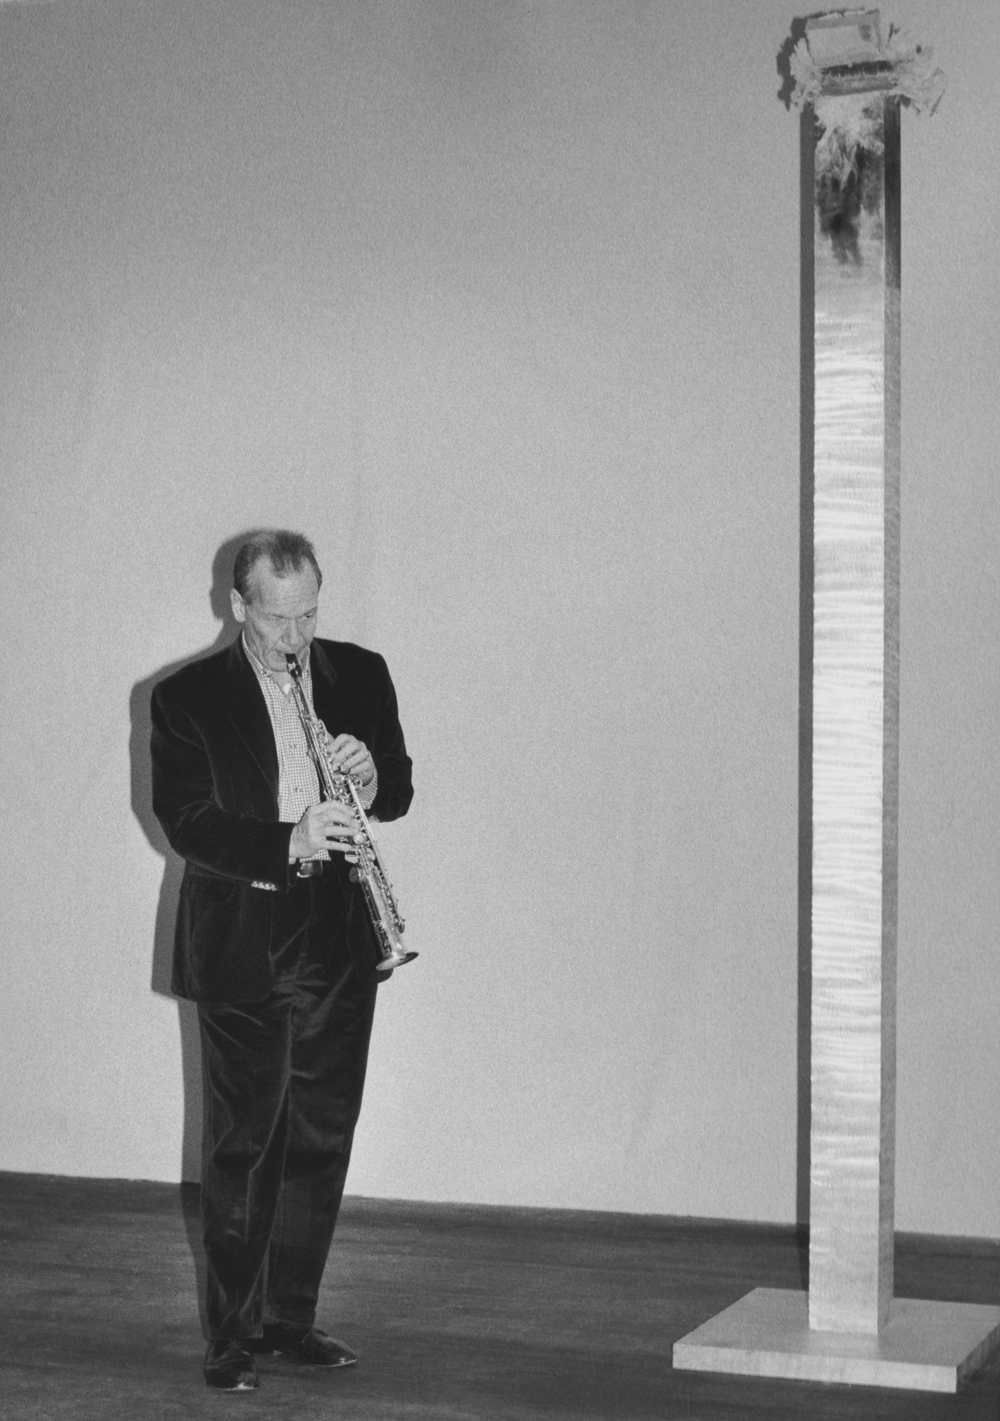 Steve Lacy performs inside Kirili'sKingsculpture, New York, Thread Waxing Space, 1992